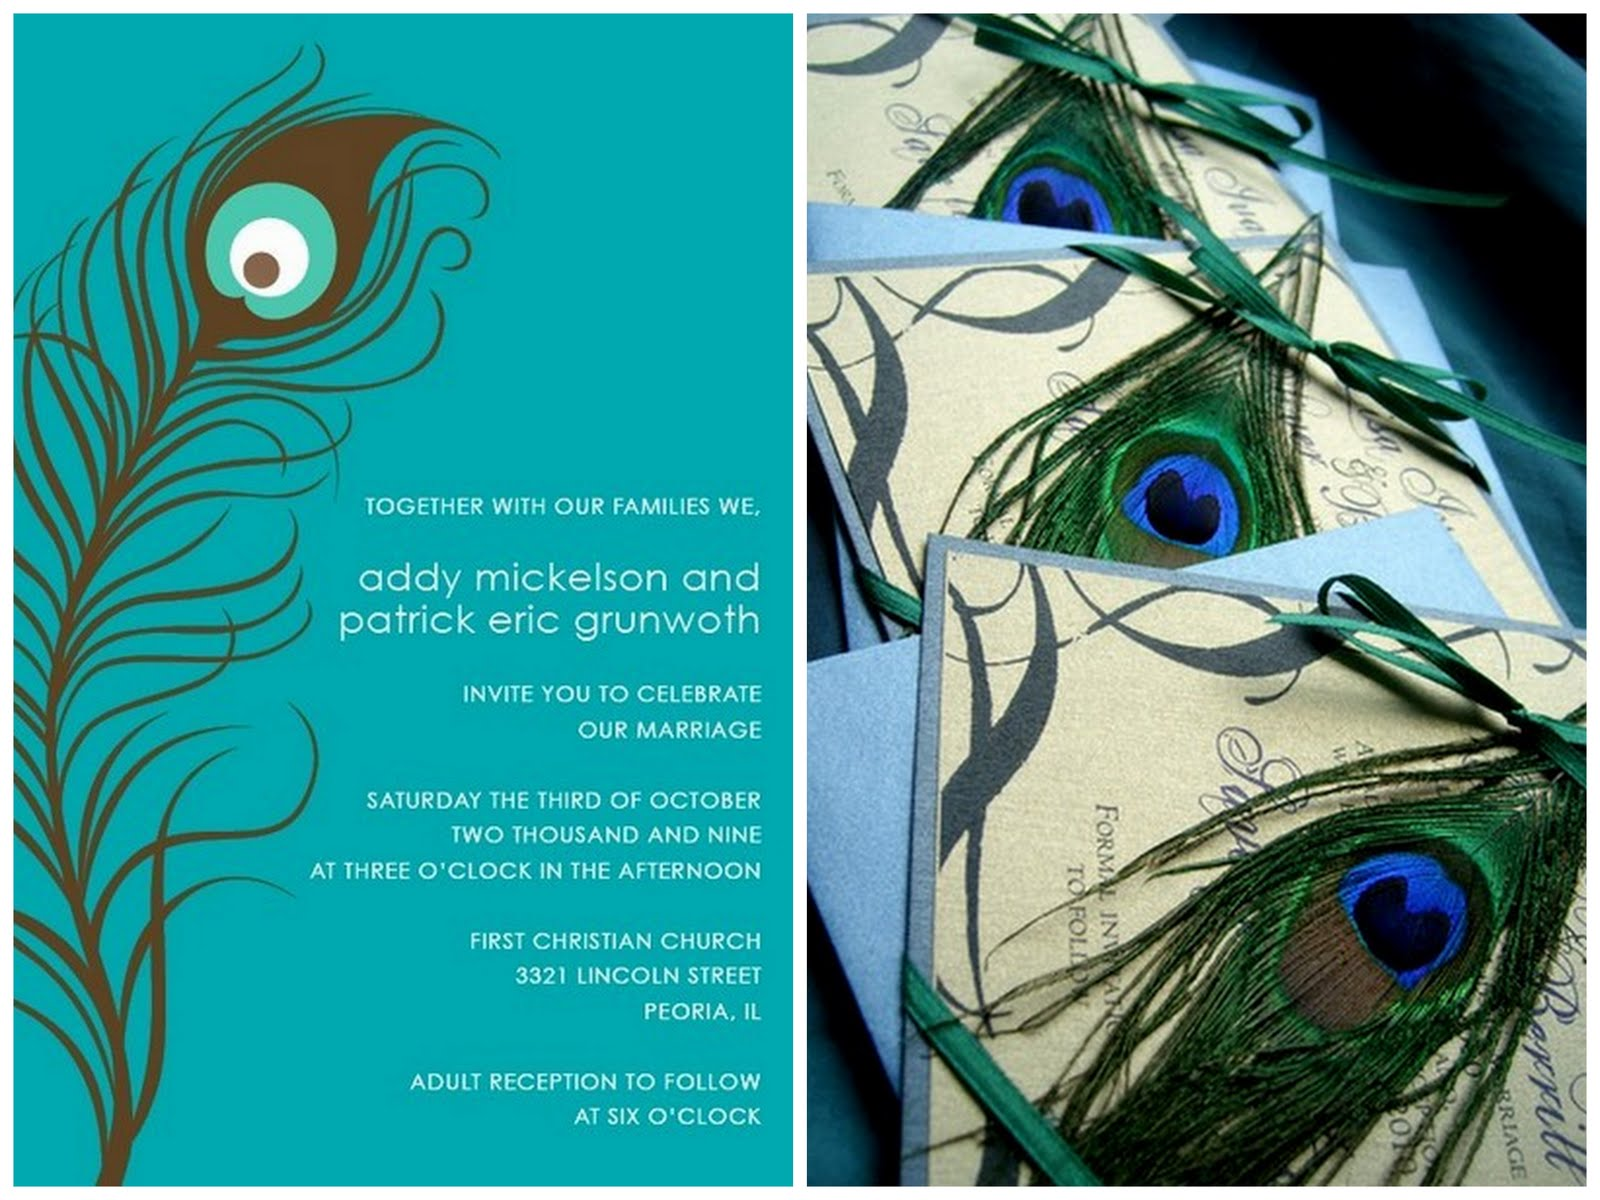 Wedding Themes - Wedding Style: A Peacock Blue Wedding - photo#24